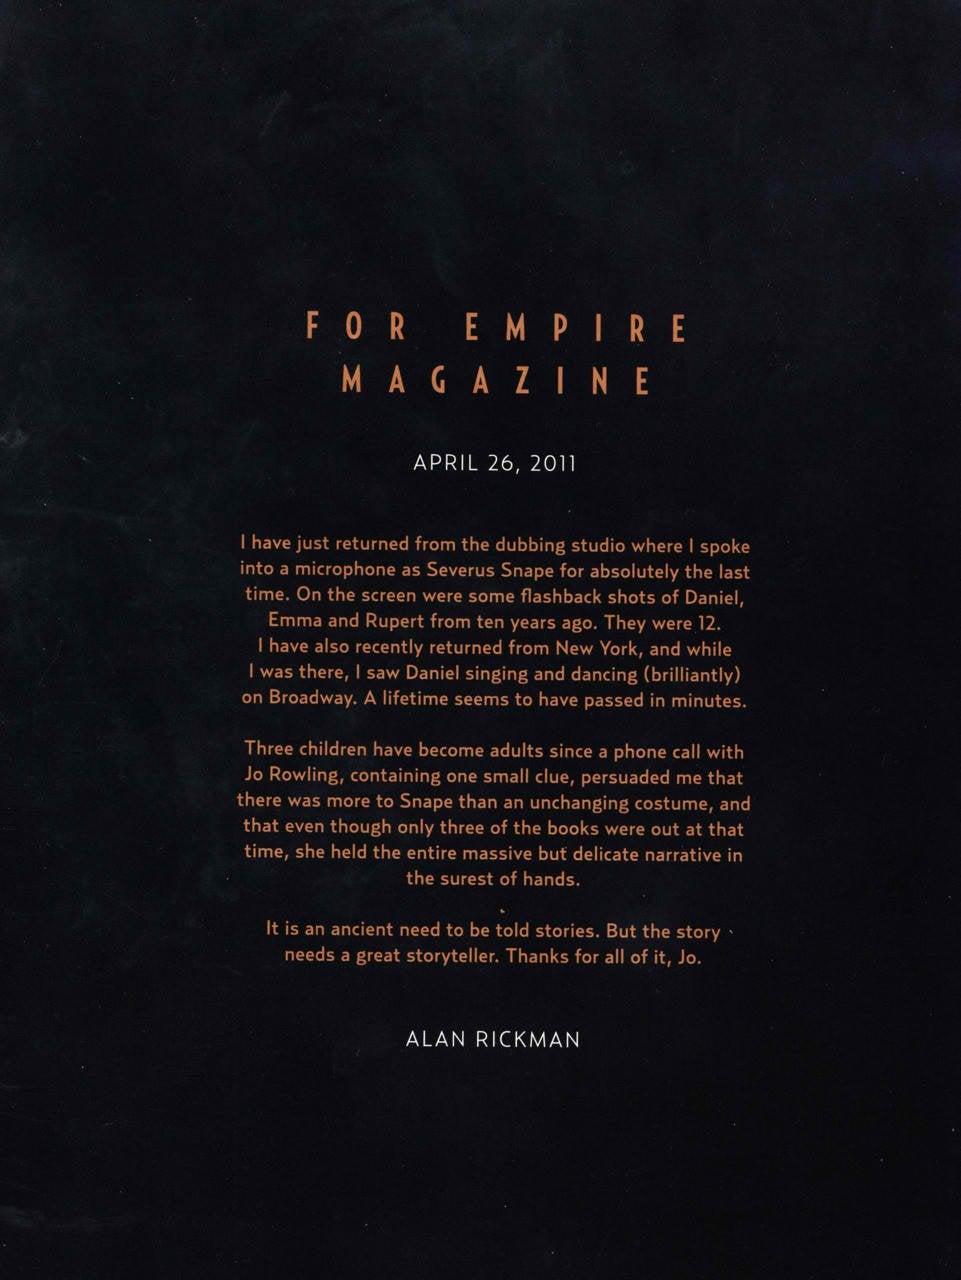 Alan Rickman: Read his heartfelt goodbye letter to Professor